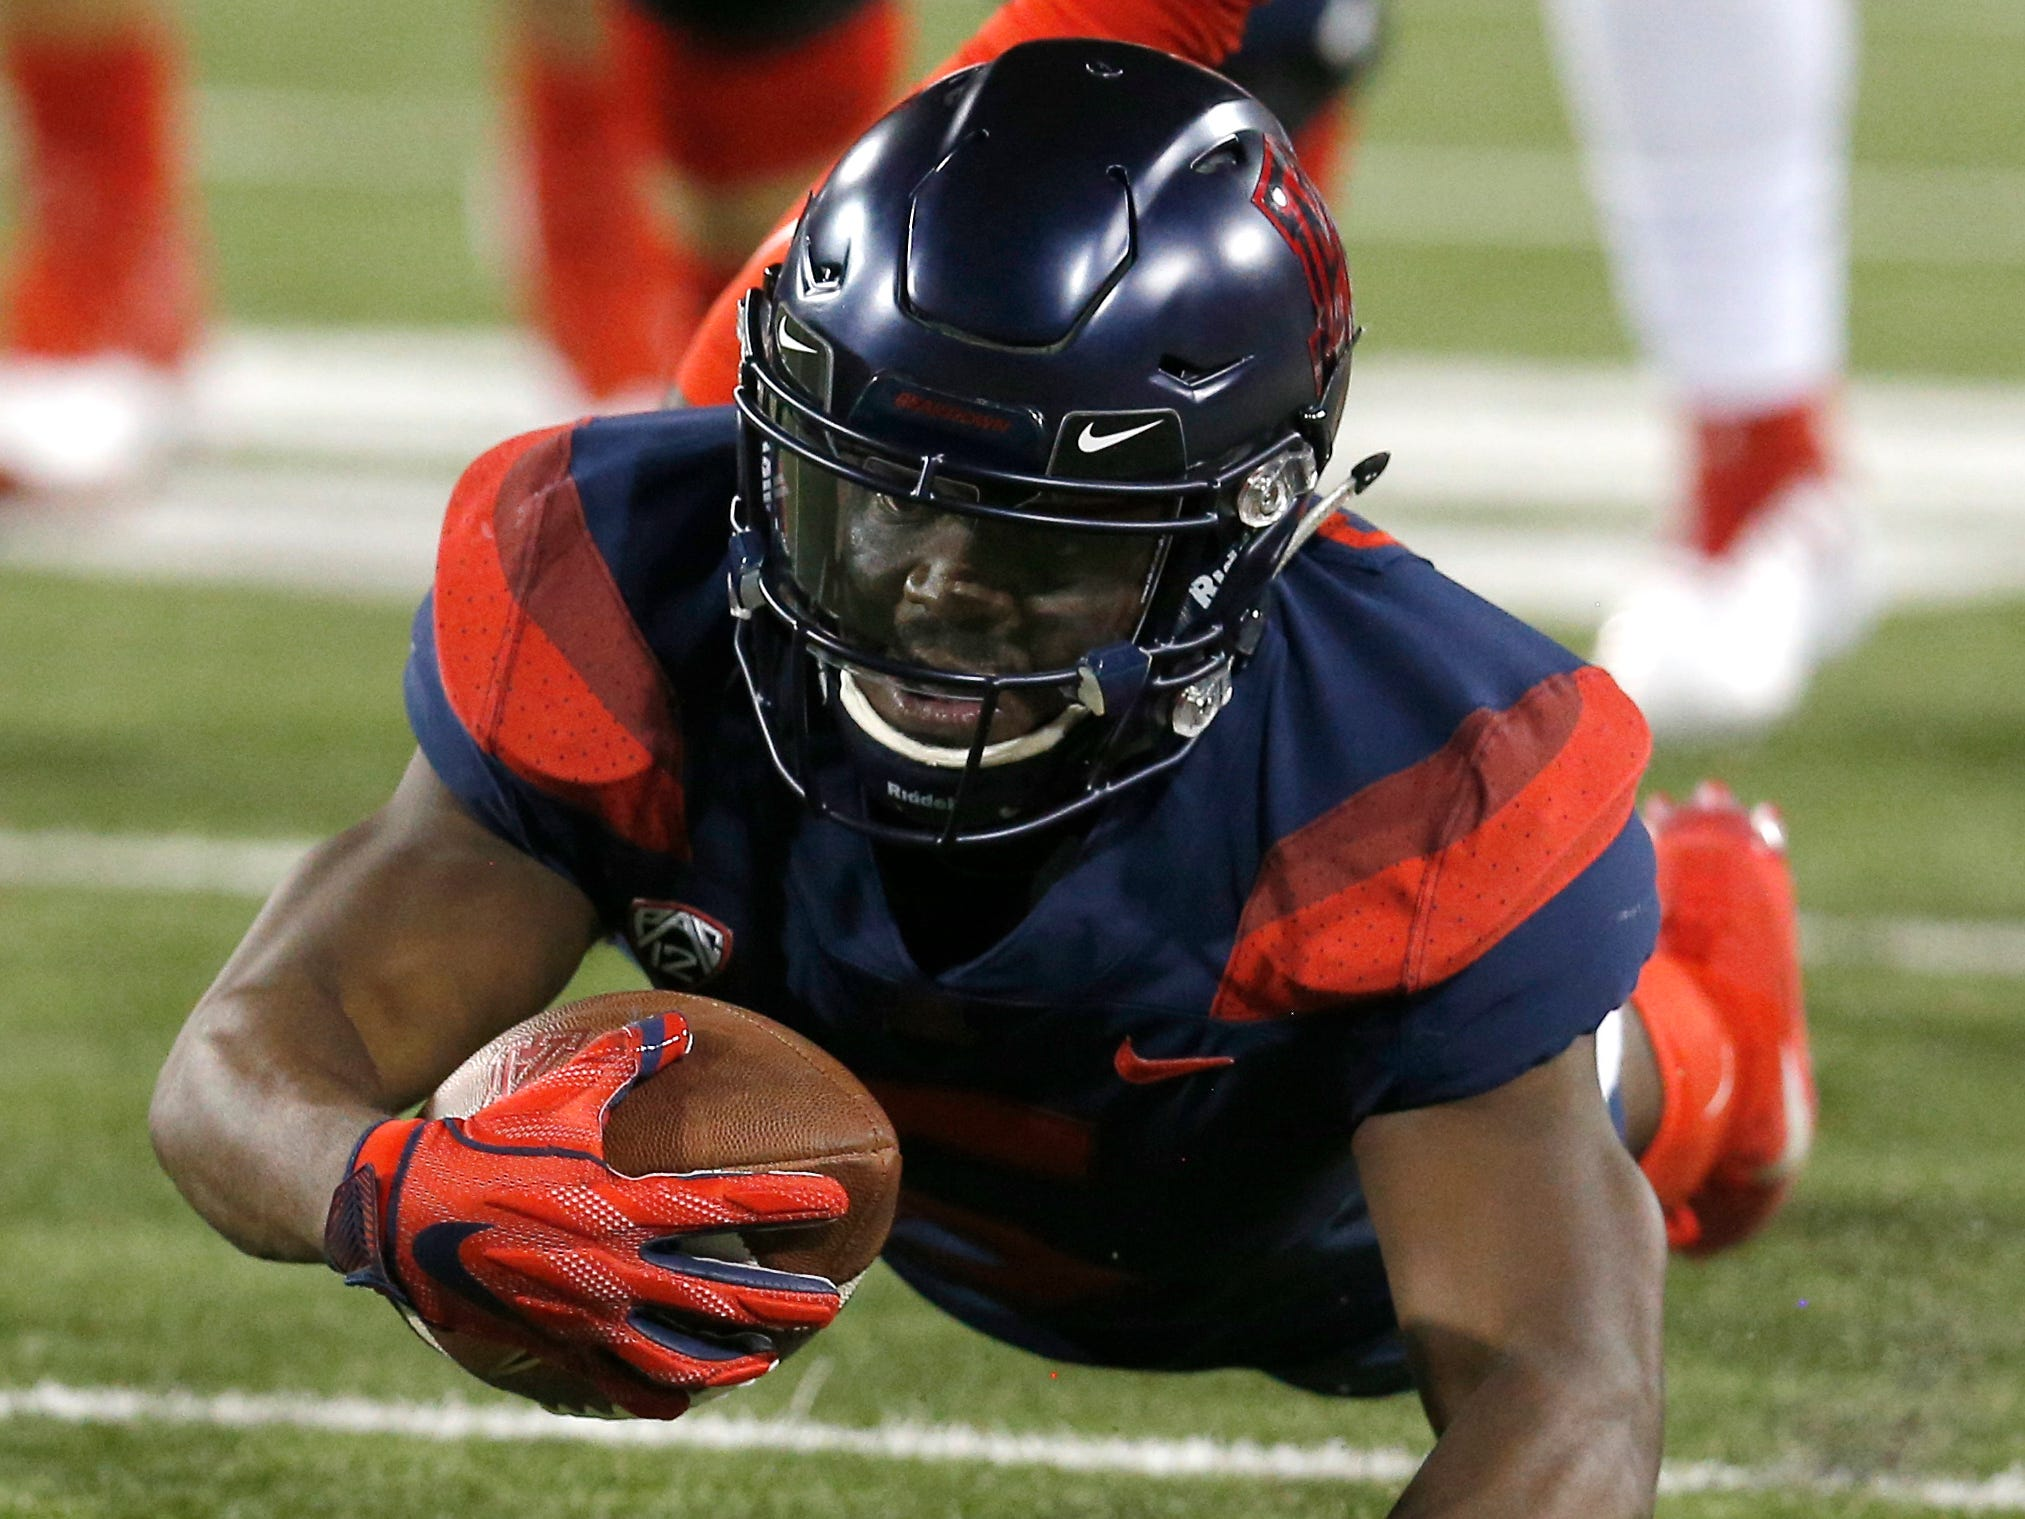 Arizona wide receiver Shun Brown (6) in the first half during an NCAA college football game against Southern Utah, Saturday, Sept. 15, 2018, in Tucson, Ariz. (AP Photo/Rick Scuteri)